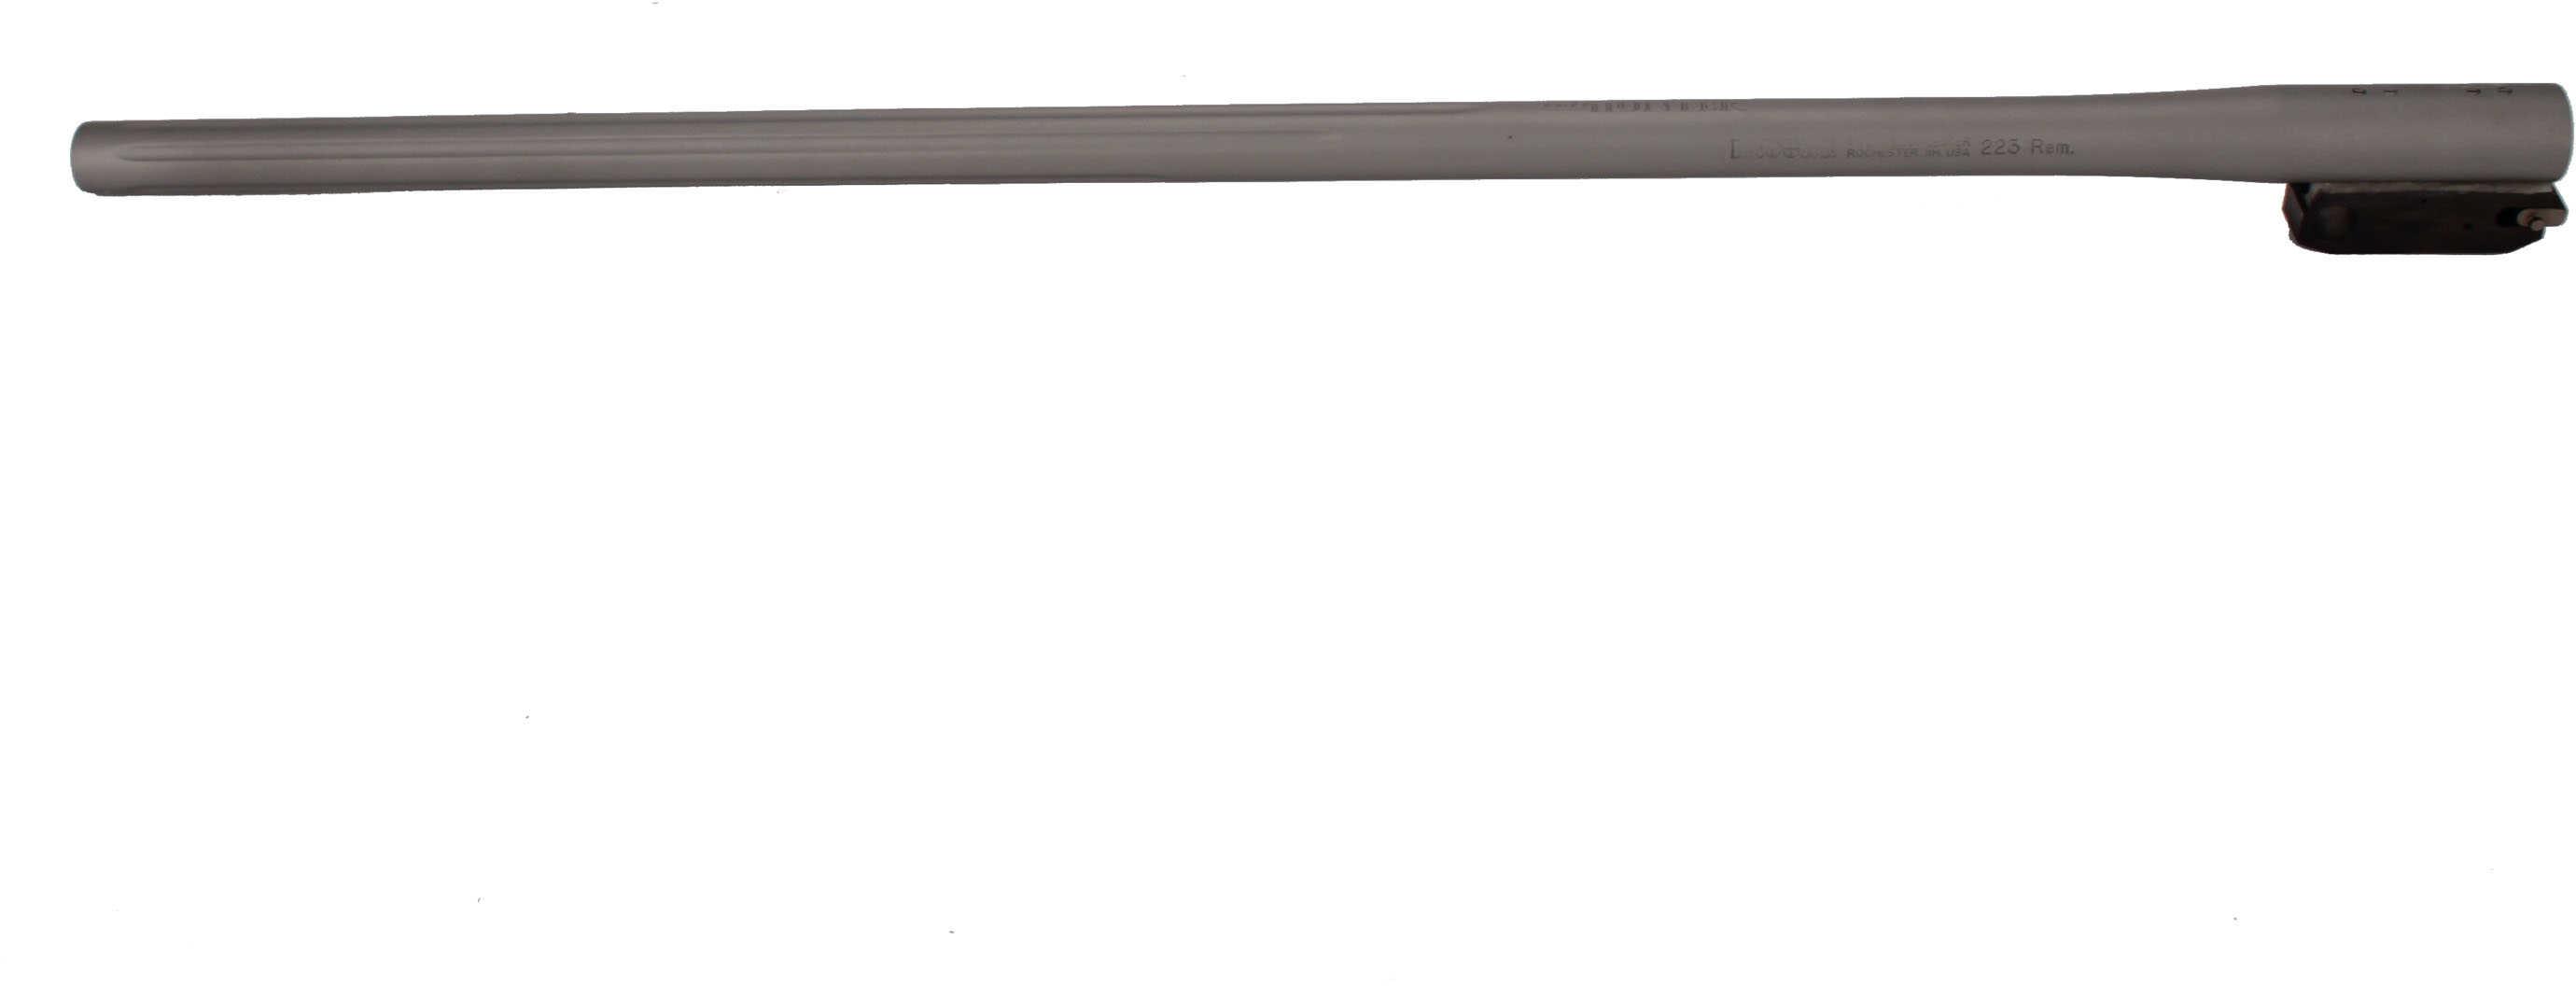 "Thompson Center Arms Pro Hunter Barrel 223 Rem 26"" Fluted Weathershield Finish No Sights 07264748"